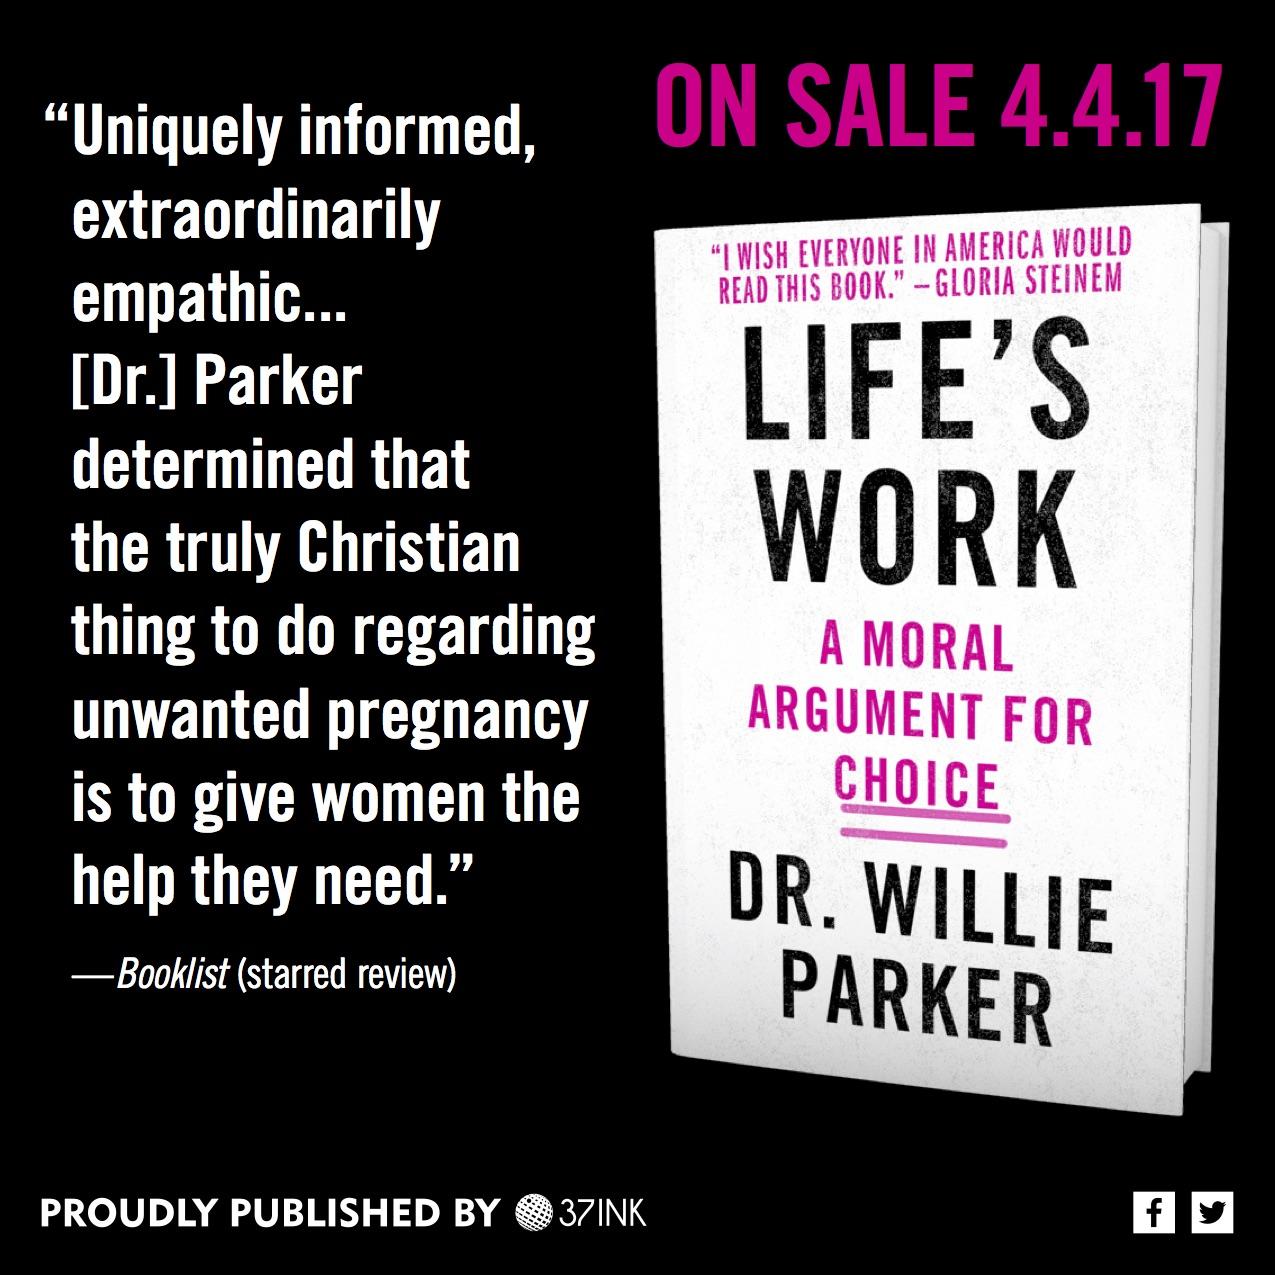 LifesWork_SocialMedia_Booklist.jpg